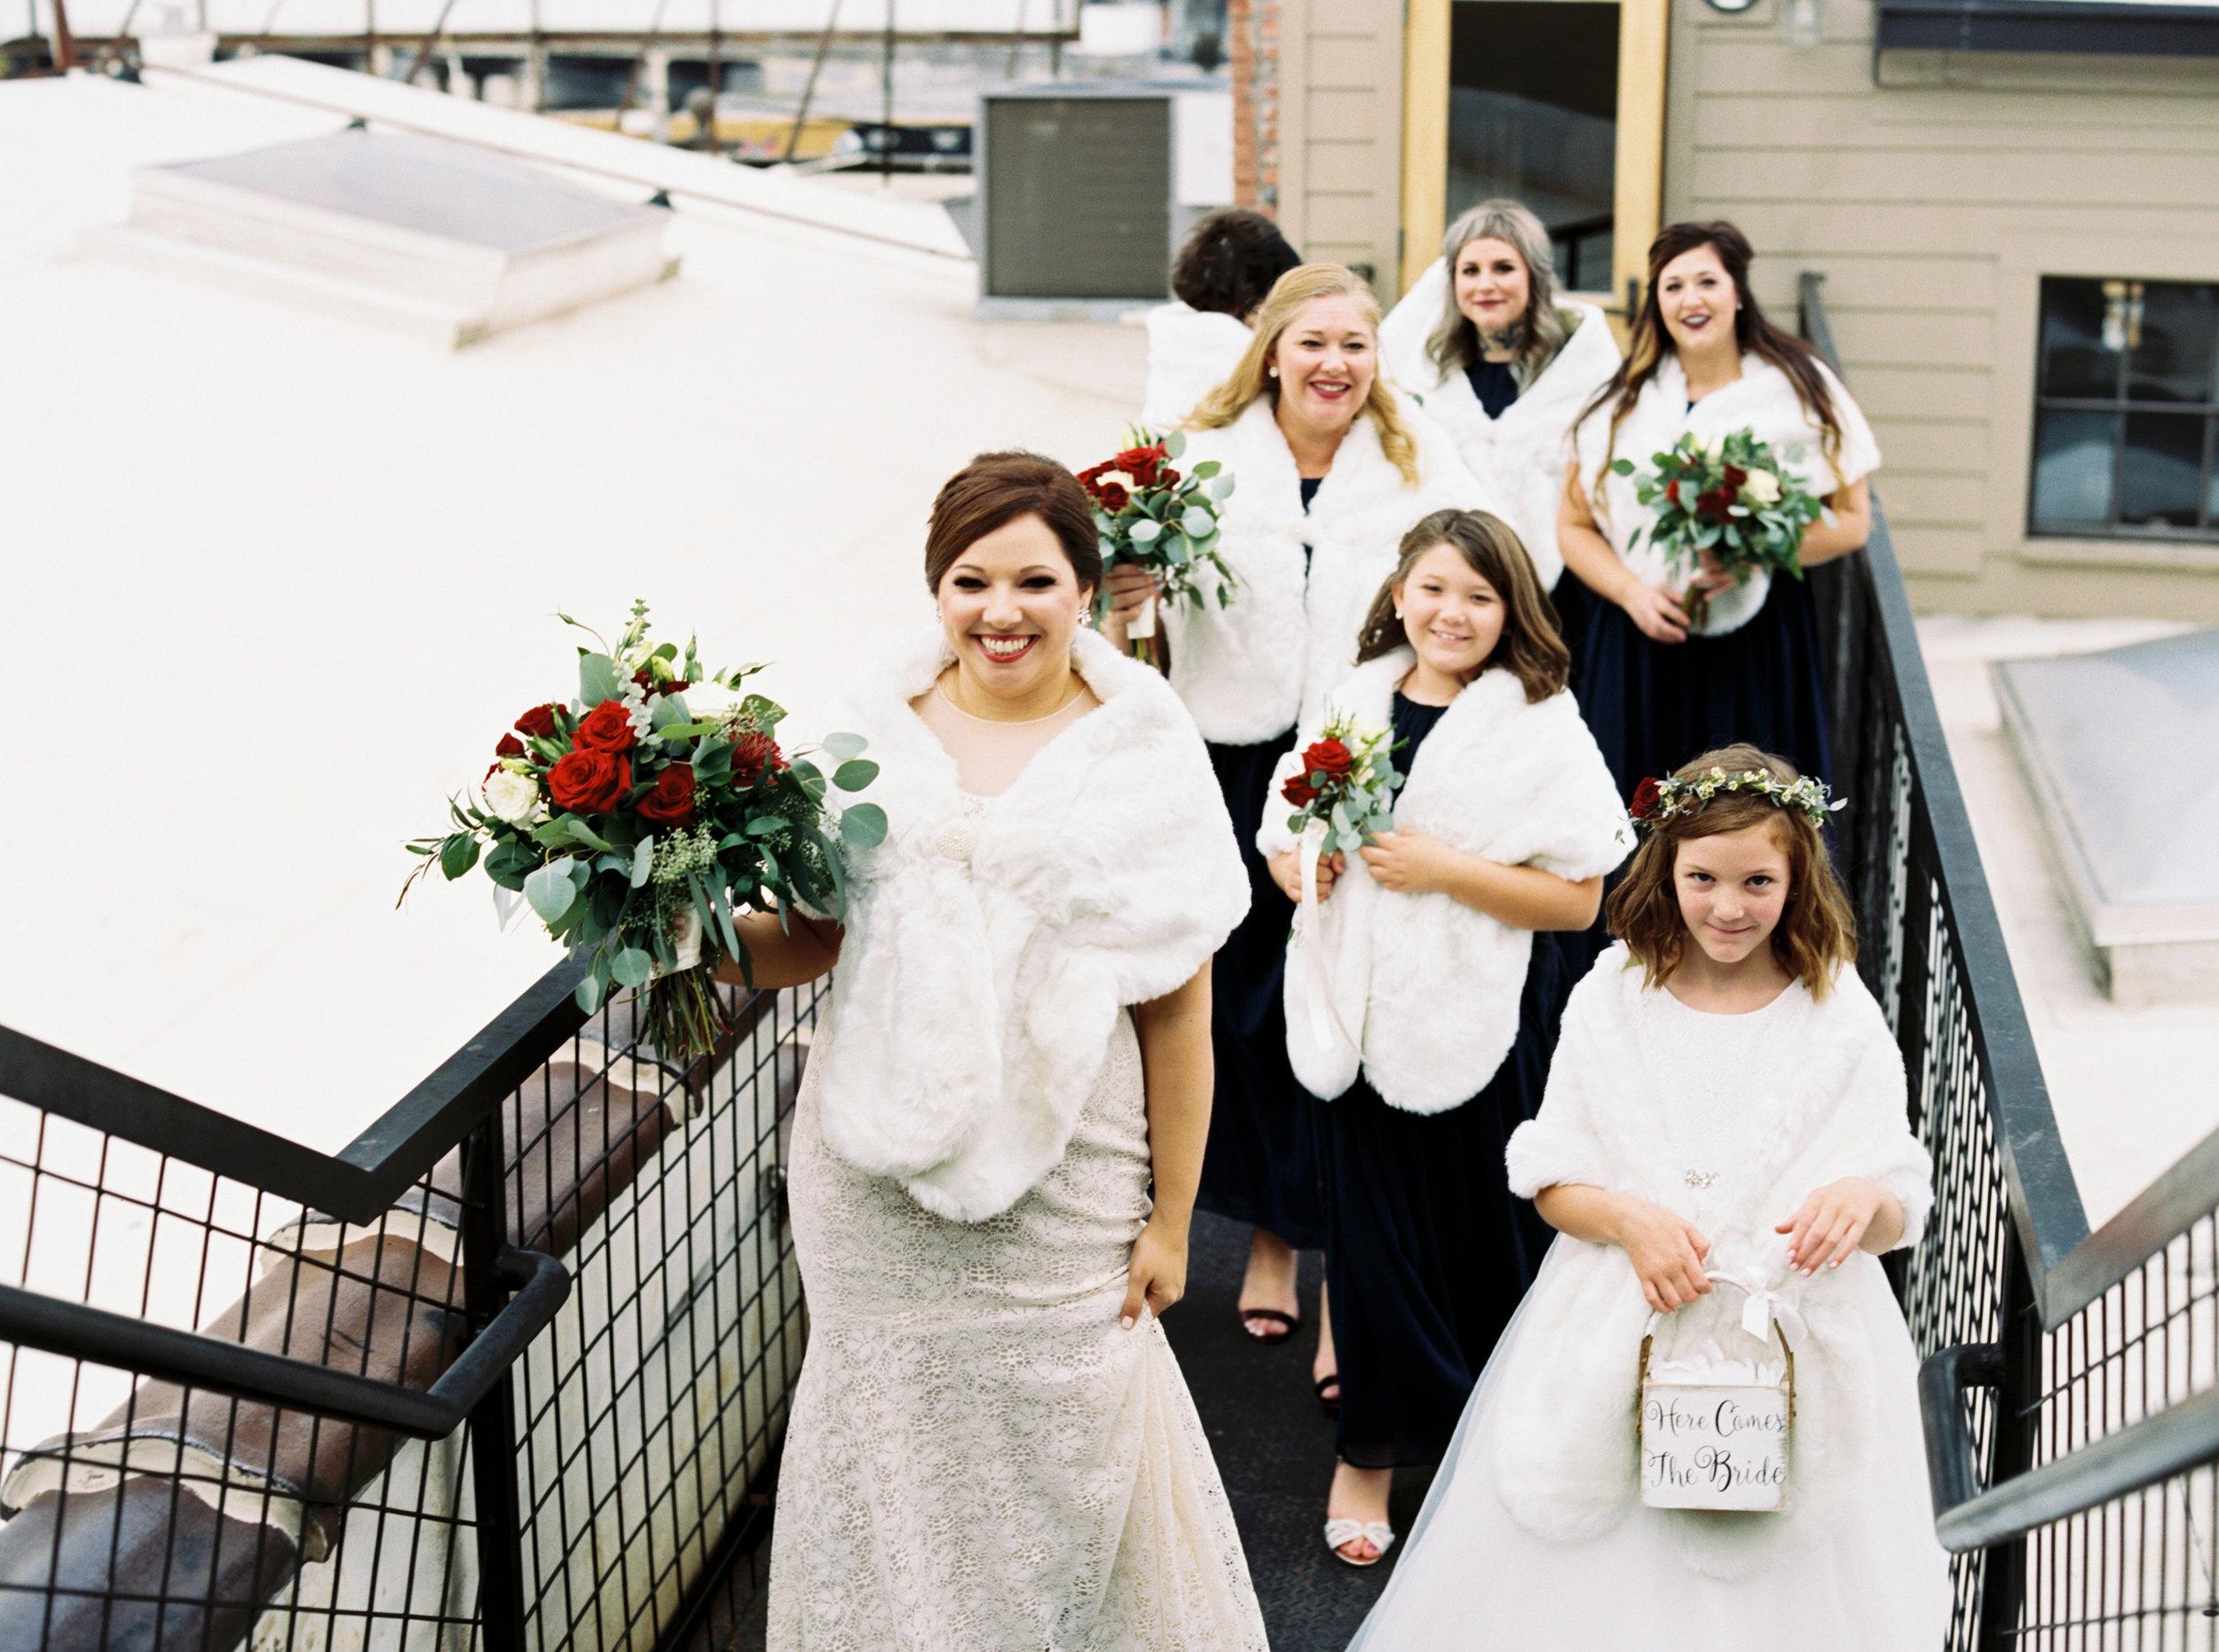 Jessica_Bryan_Wedding_Standard_Knoxville_Abigail_Malone_Photography-312.jpg